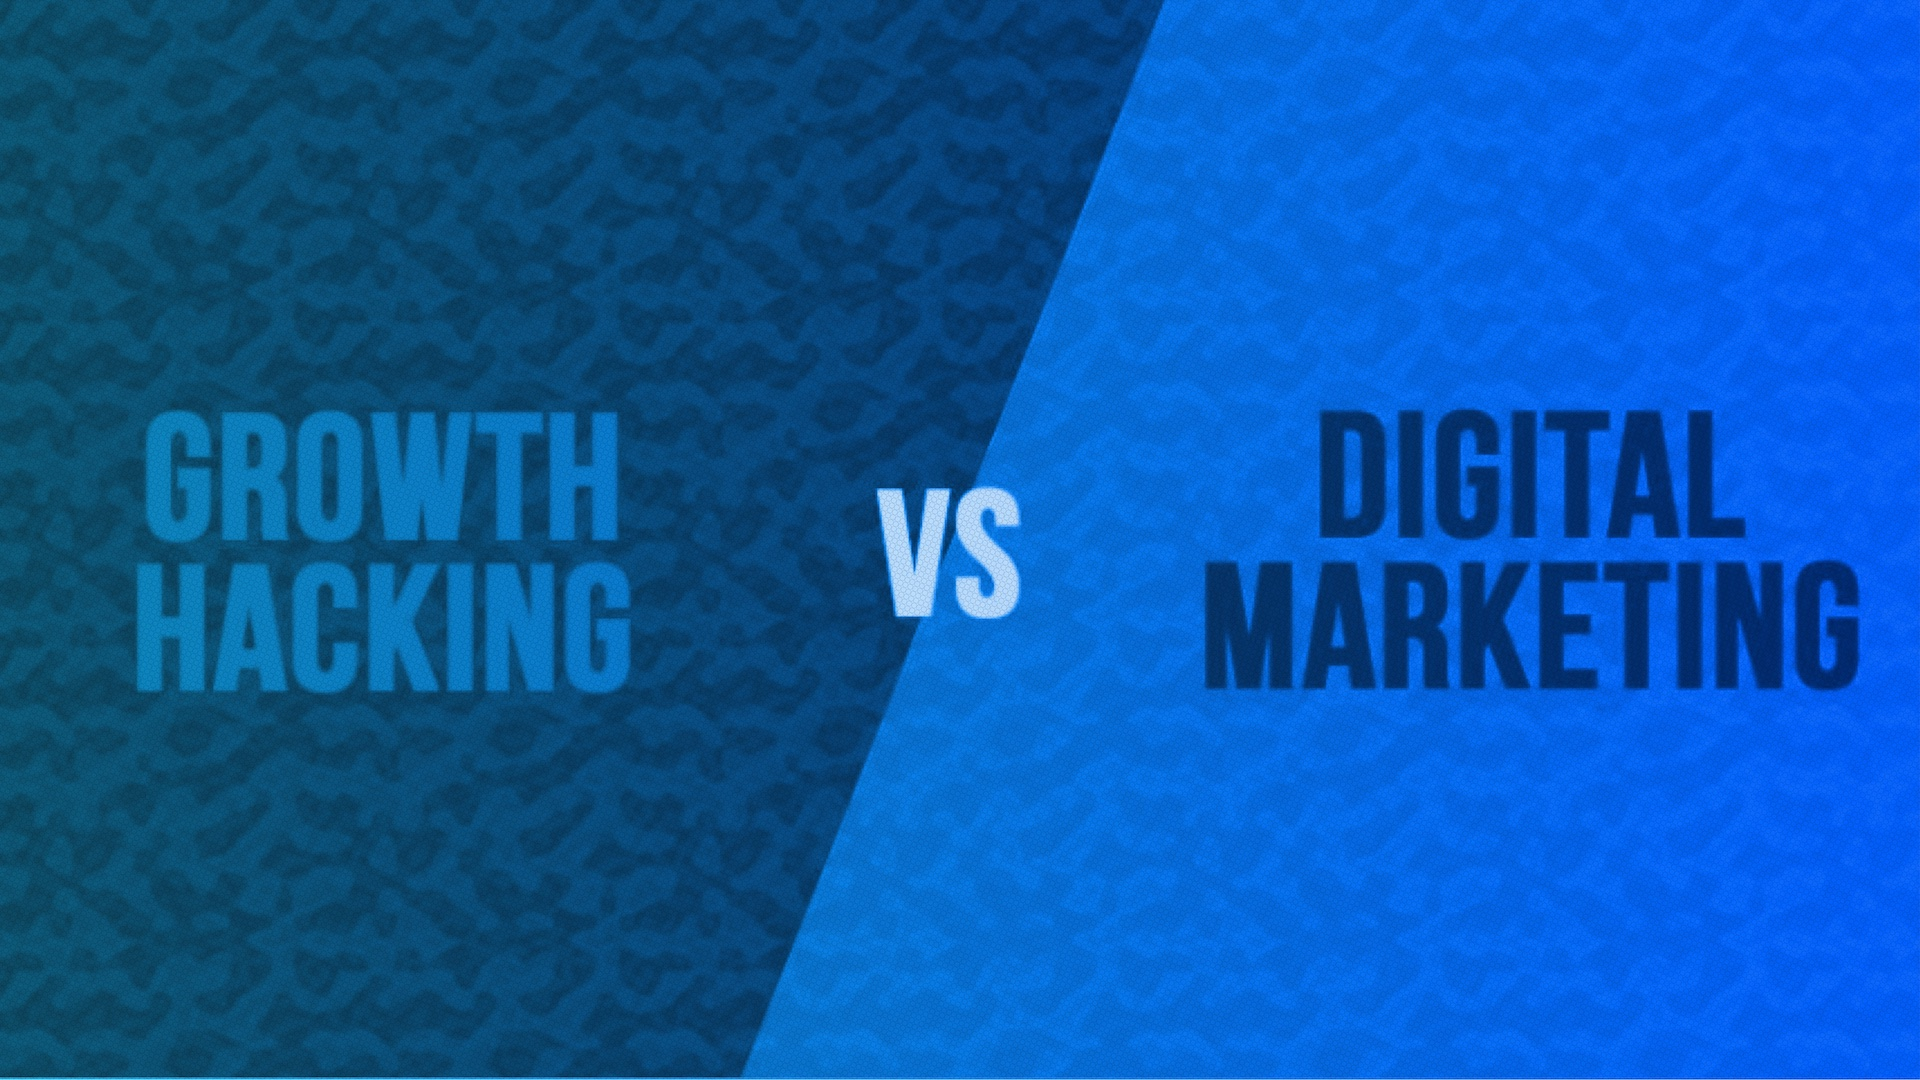 Growth hacker marketing vs. digital marketing?